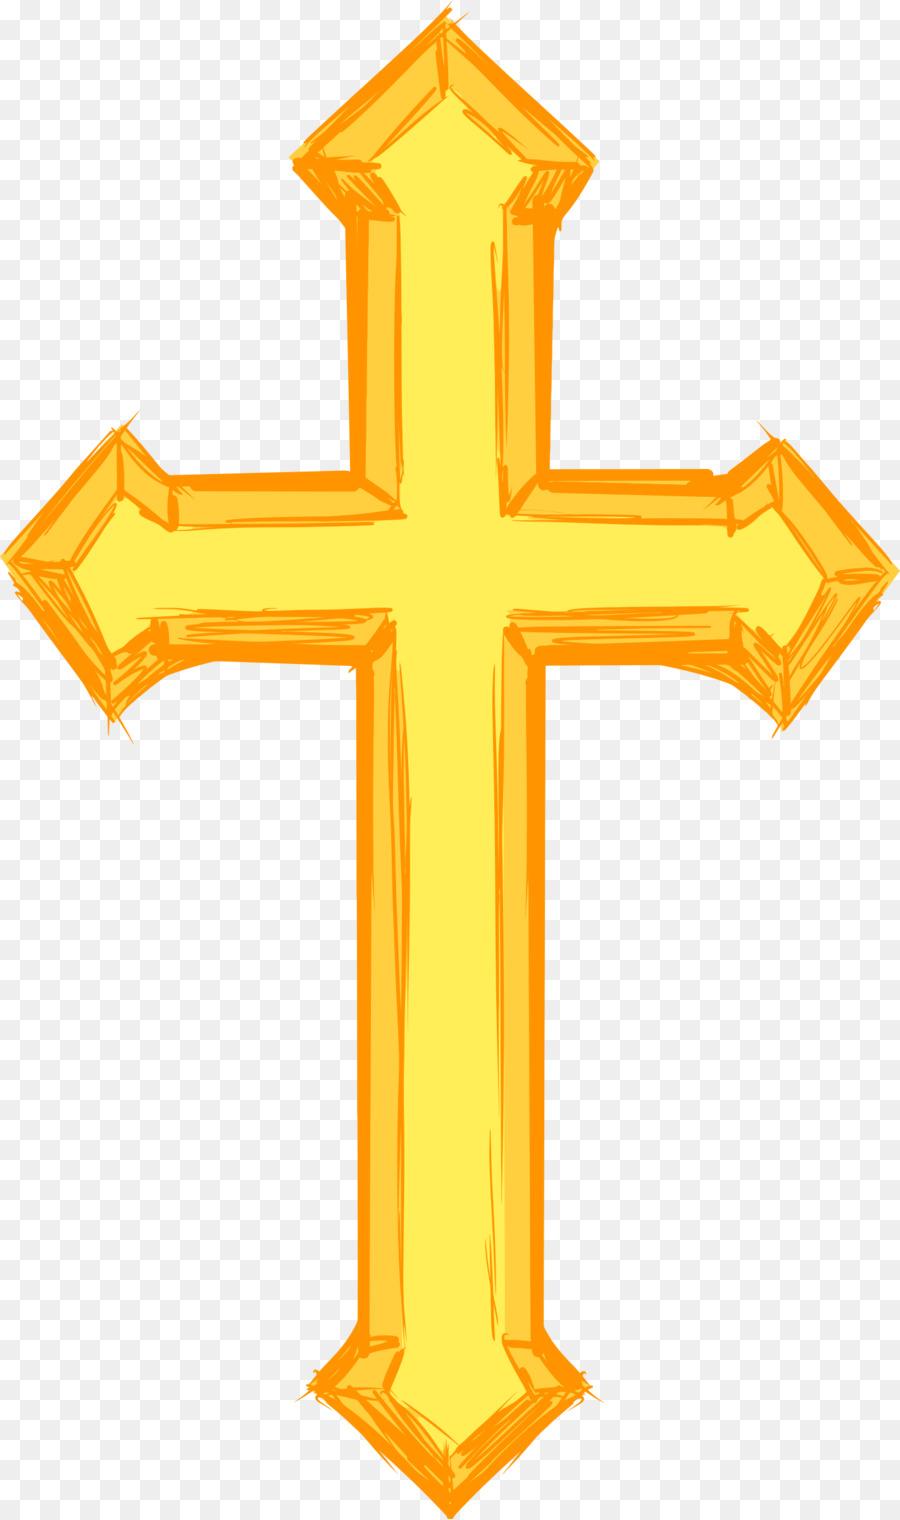 christian cross symbol crucifix clip art cross png download 1422 rh kisspng com free catholic crucifix clipart crucifix clipart free